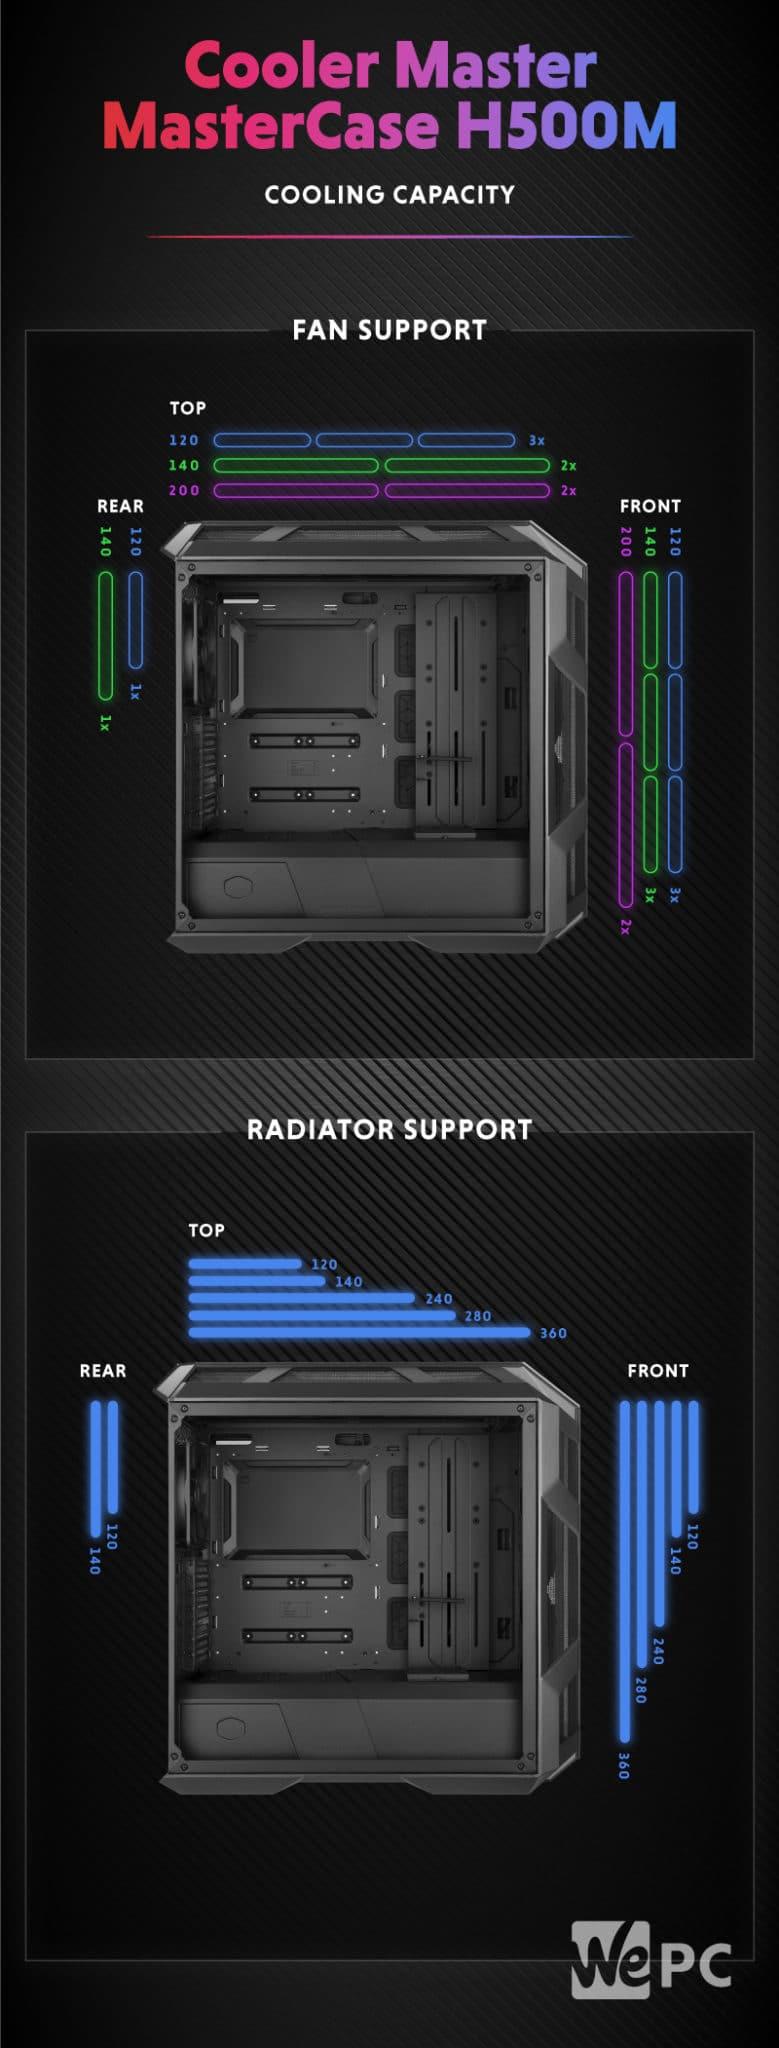 Cooler Master MasterCase H500M Cooling Capacity 1